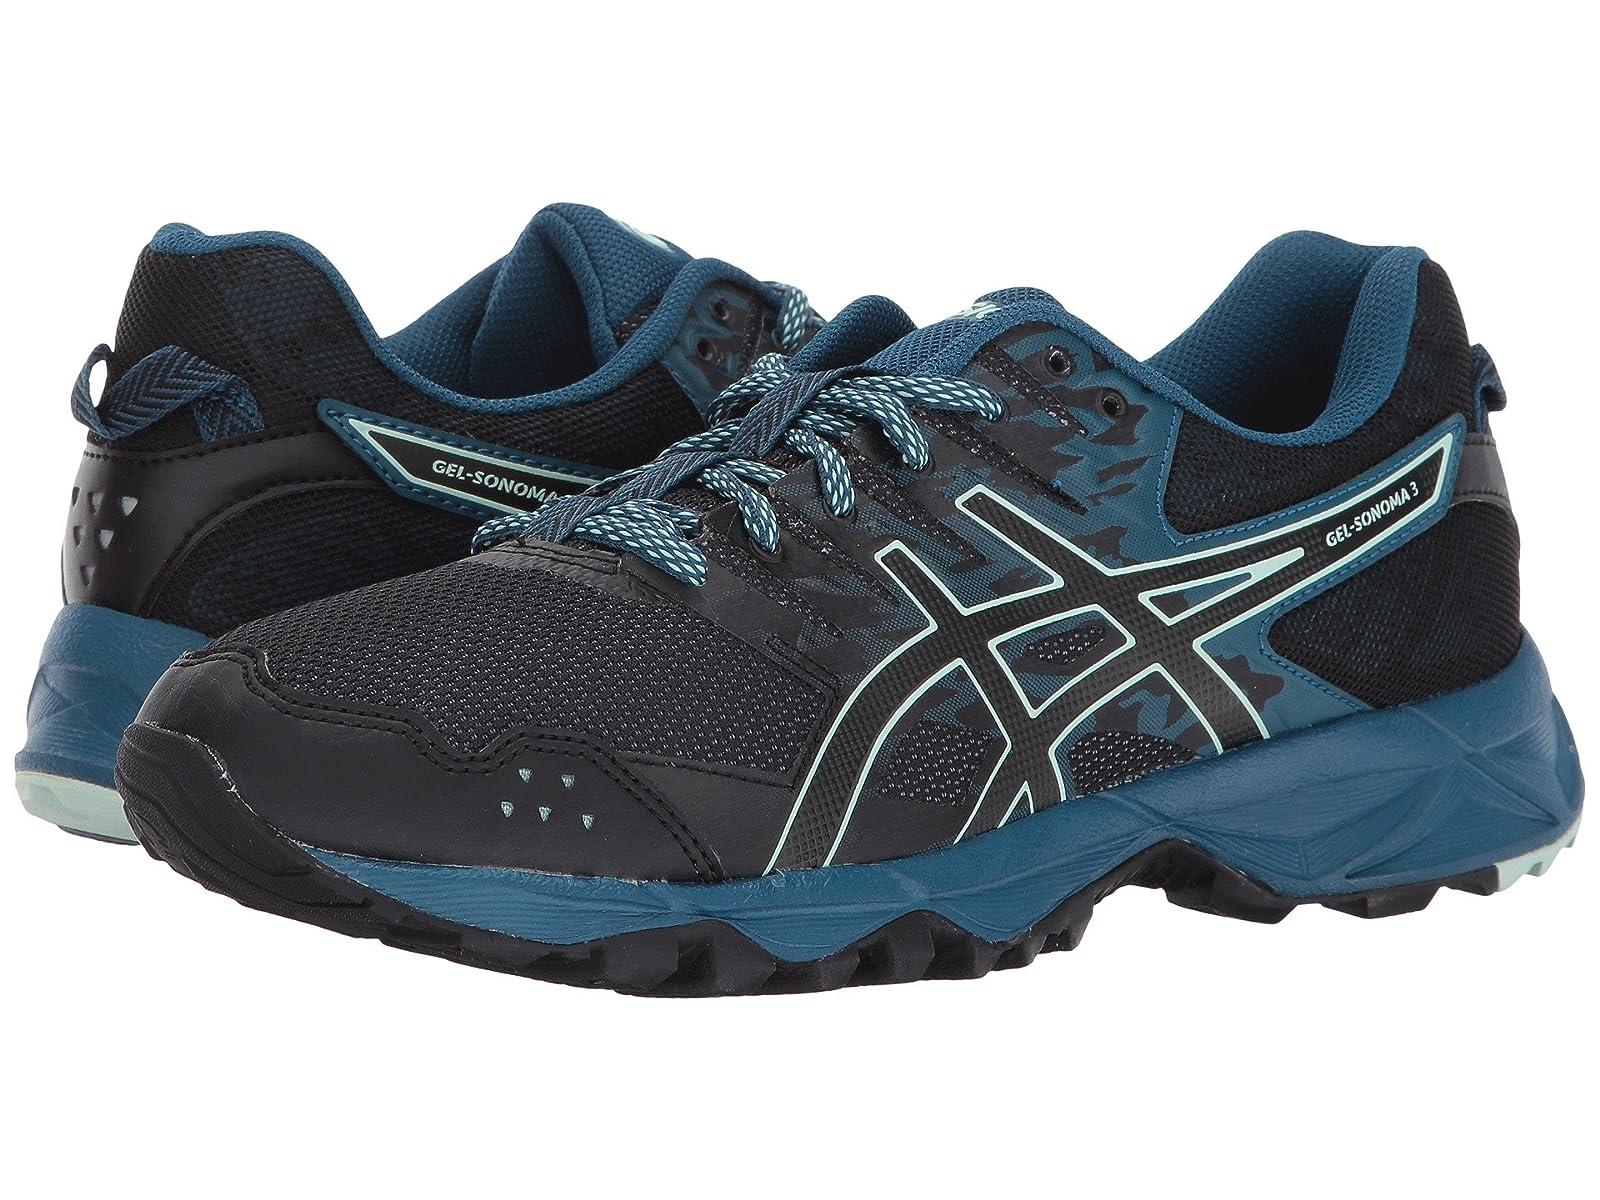 ASICS GEL-Sonoma 3Atmospheric grades have affordable shoes